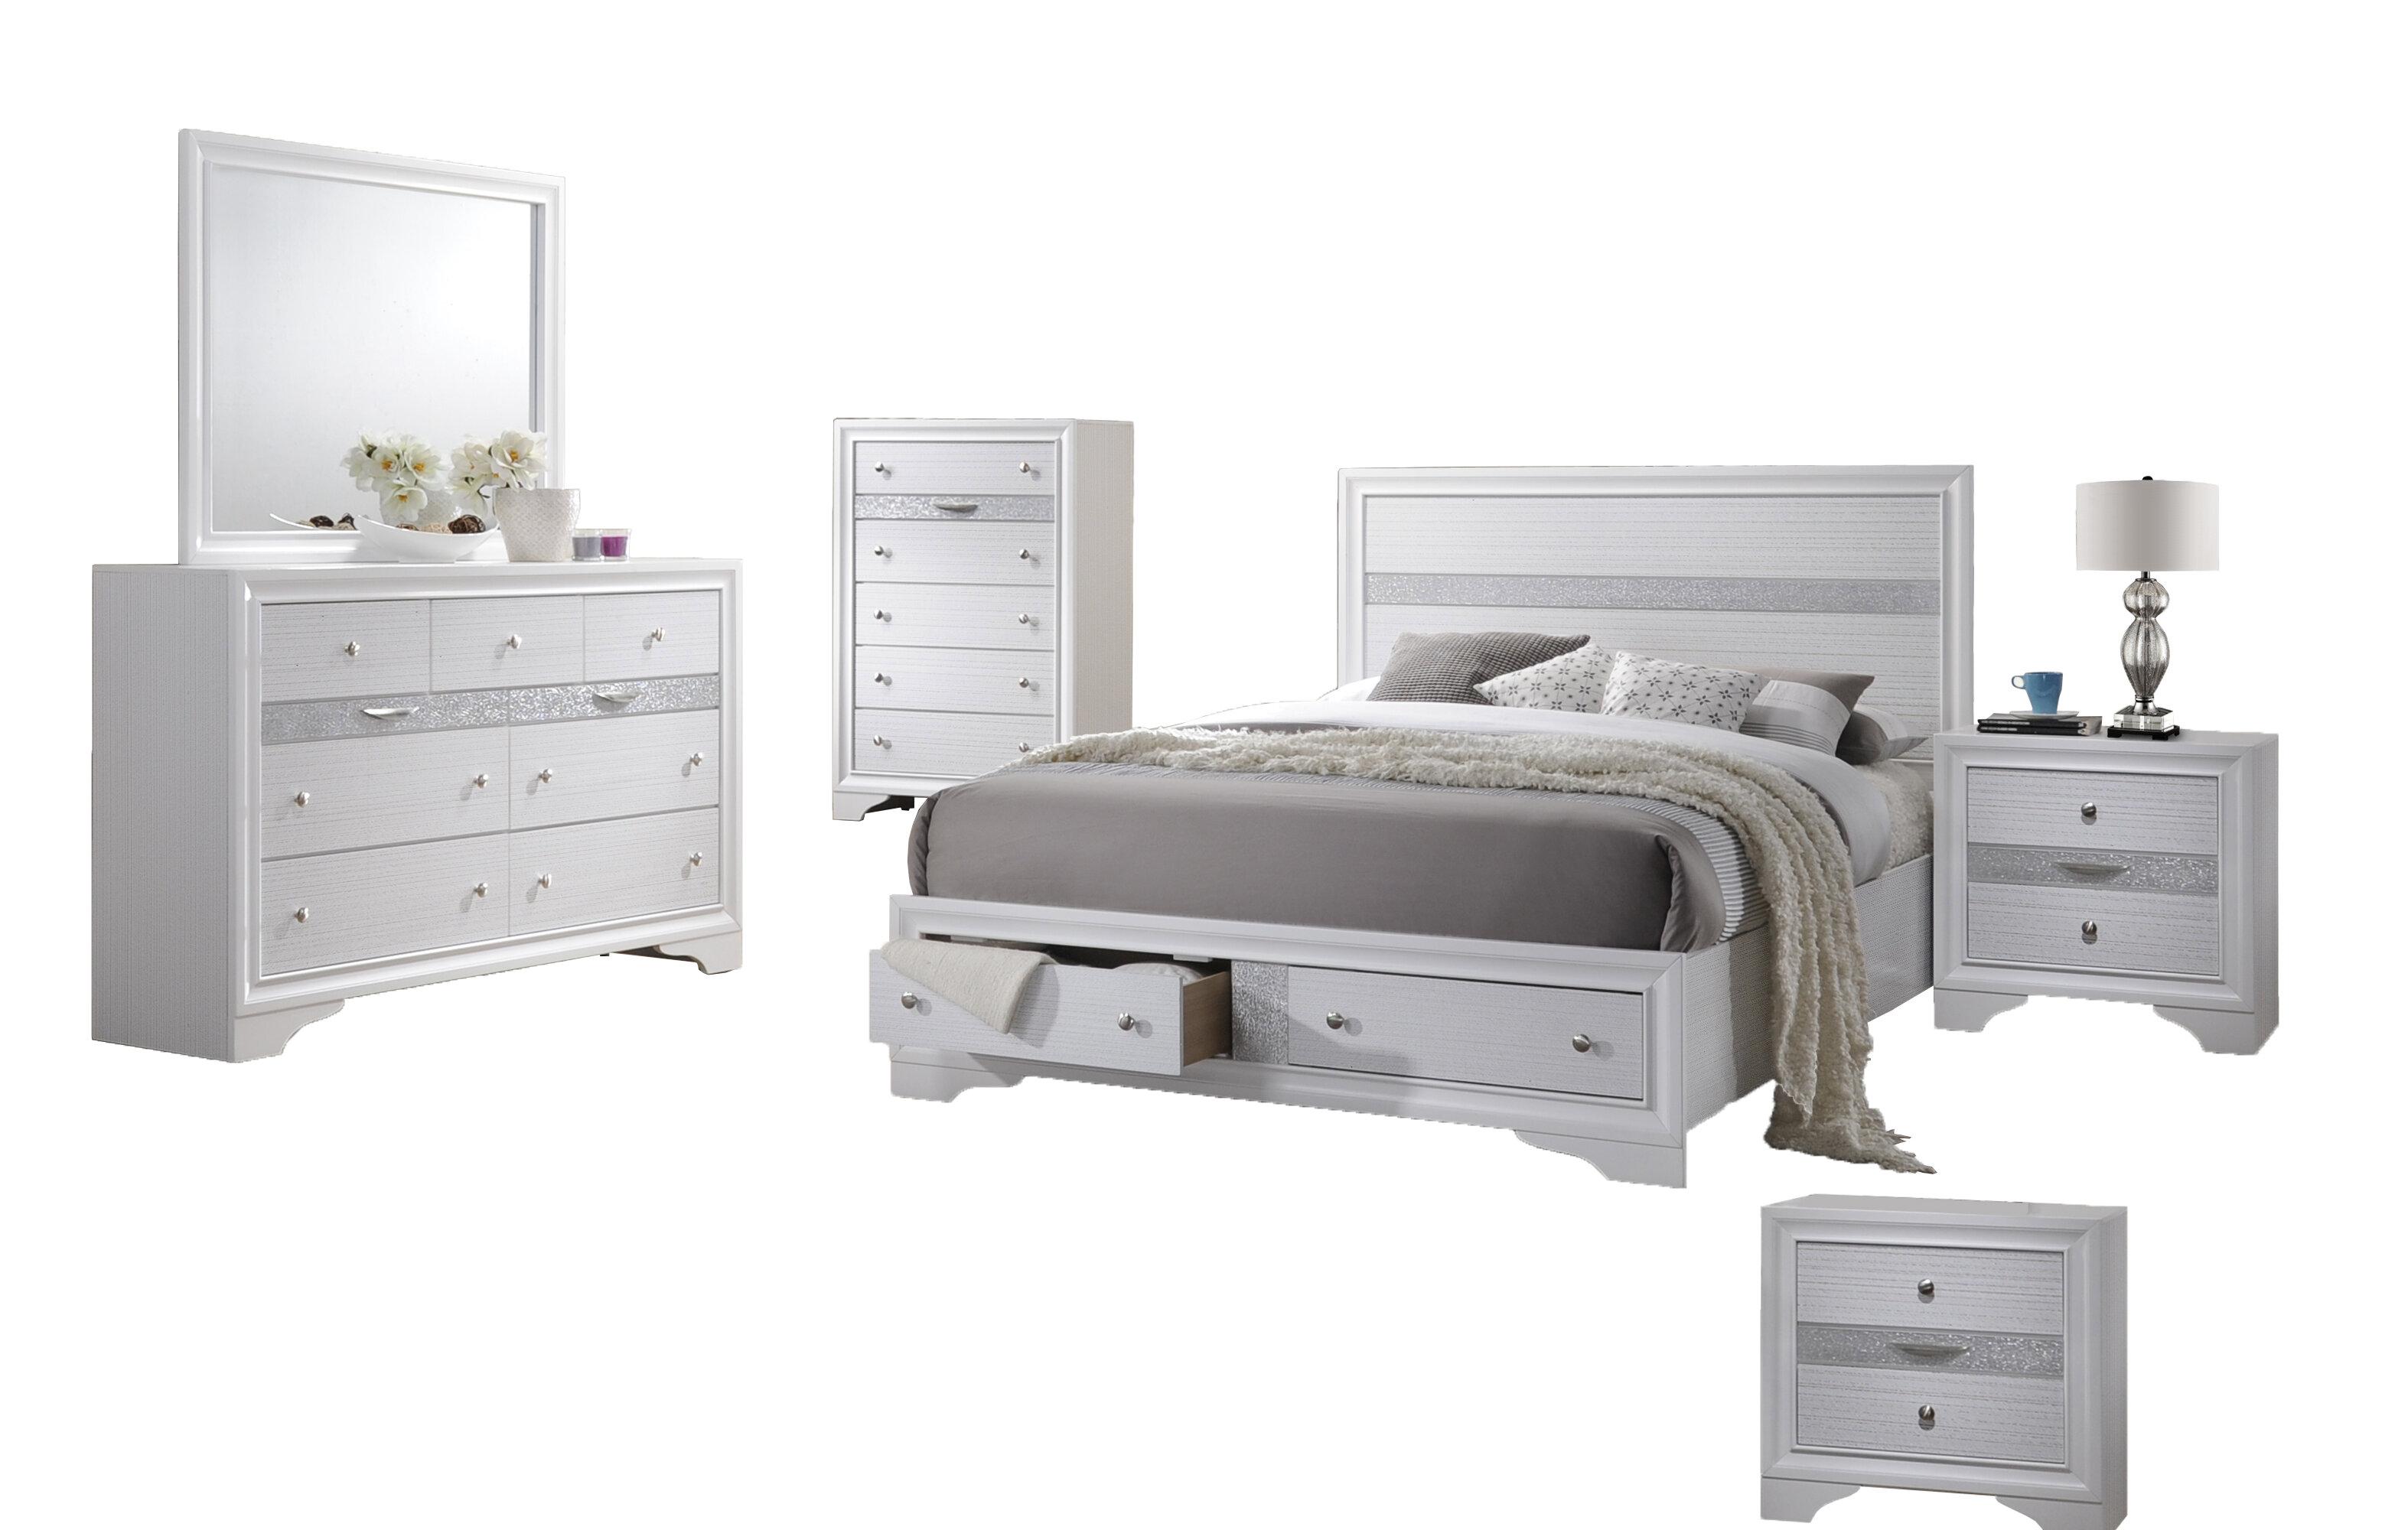 Ewan Standard 7 Piece Bedroom Set